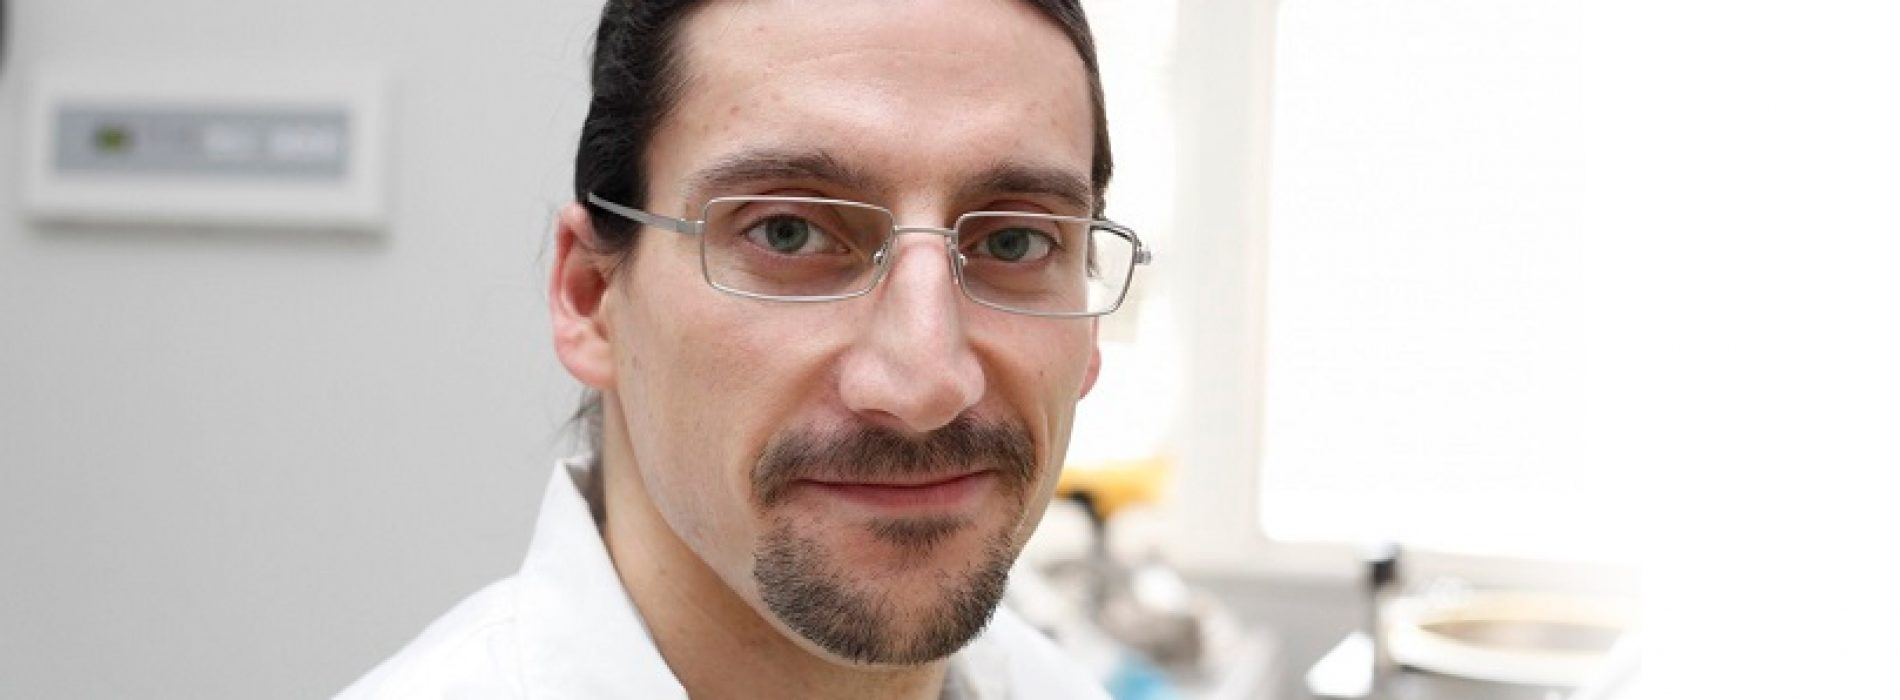 Interview with Dr. Daniel Paredes-Sabja. International level science: New Millennium Nucleus of Intestinal Microbiota